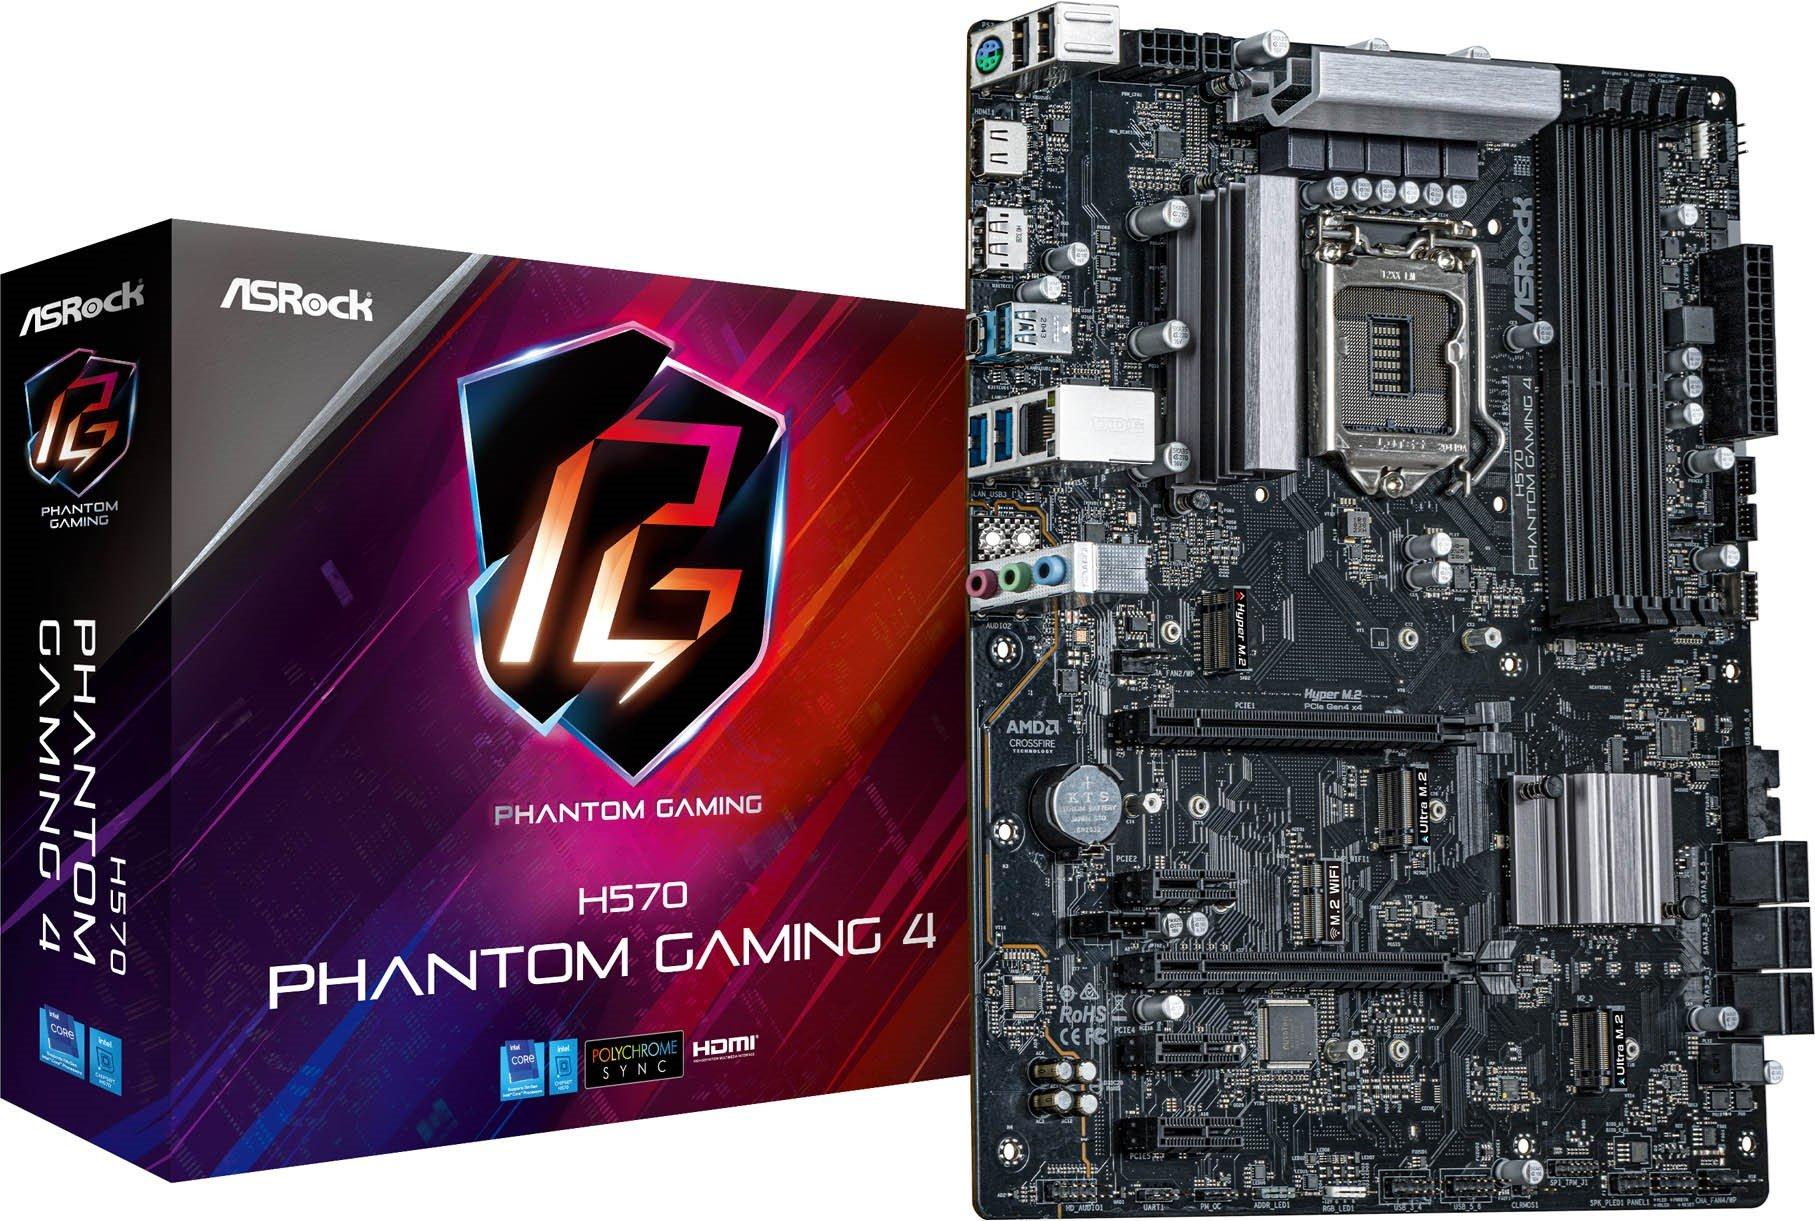 ASRock H570 Phantom Gaming 4 Intel Motherboard with USB 3.2 Gen2x2 - £104.66 delivered @ CCLOnline